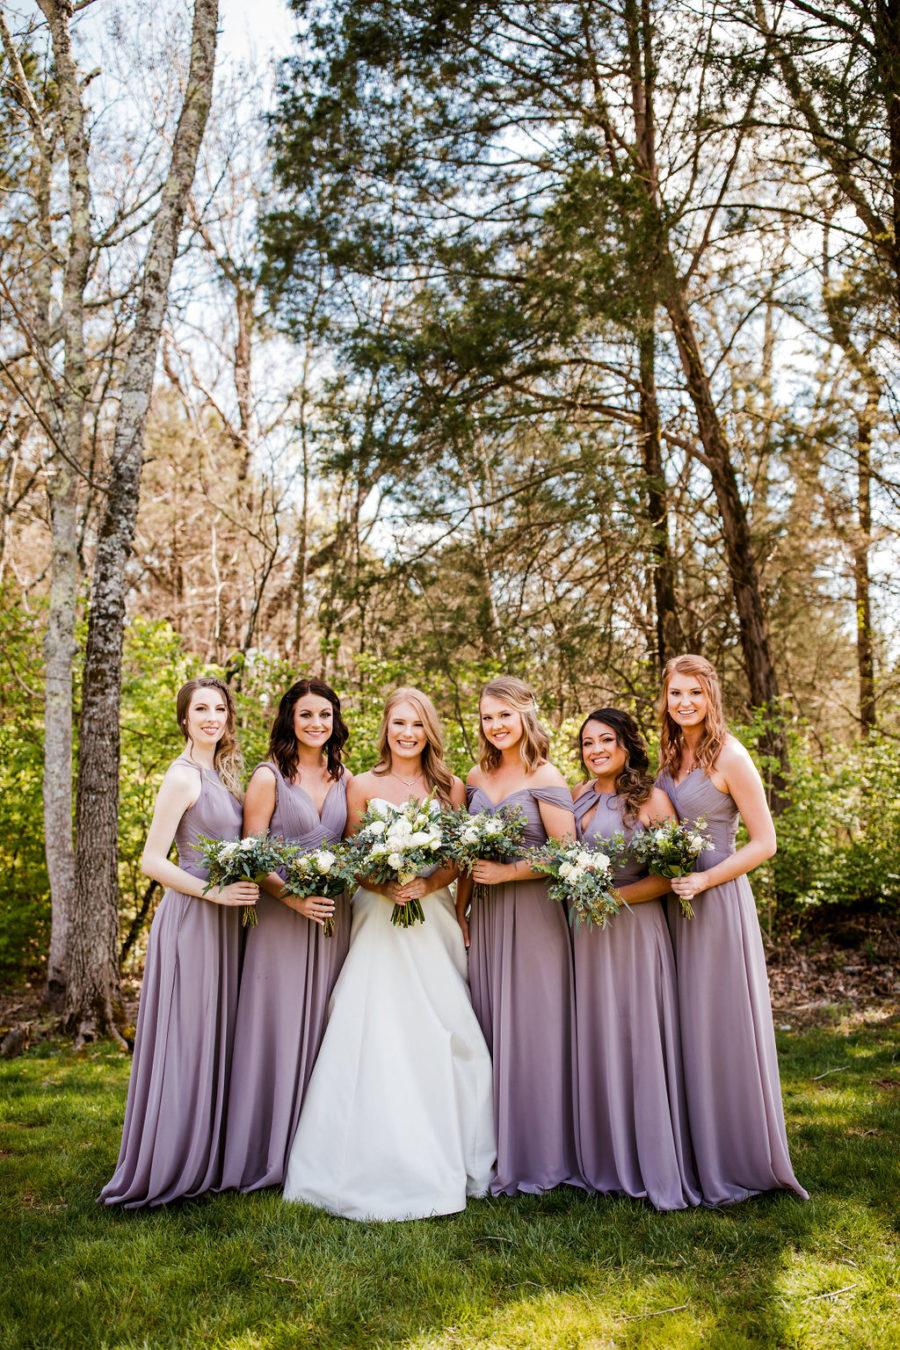 Light Purple Bridesmaid Dresses: Beautiful Graystone Quarry Wedding captured by John Myers Photography & Videography